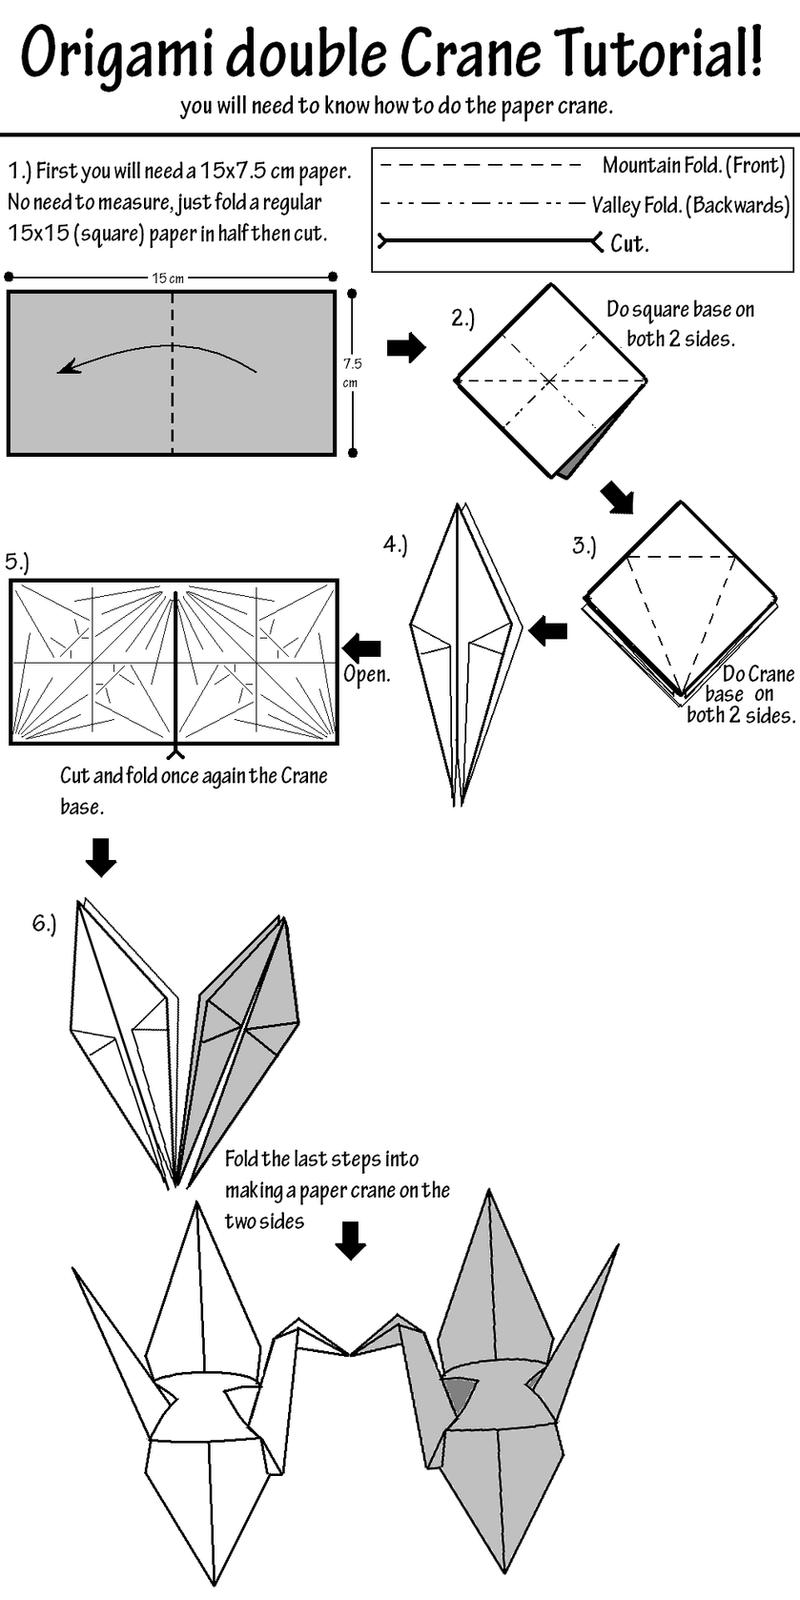 origami kissing crane tutorial by salvare0zero0 on deviantart